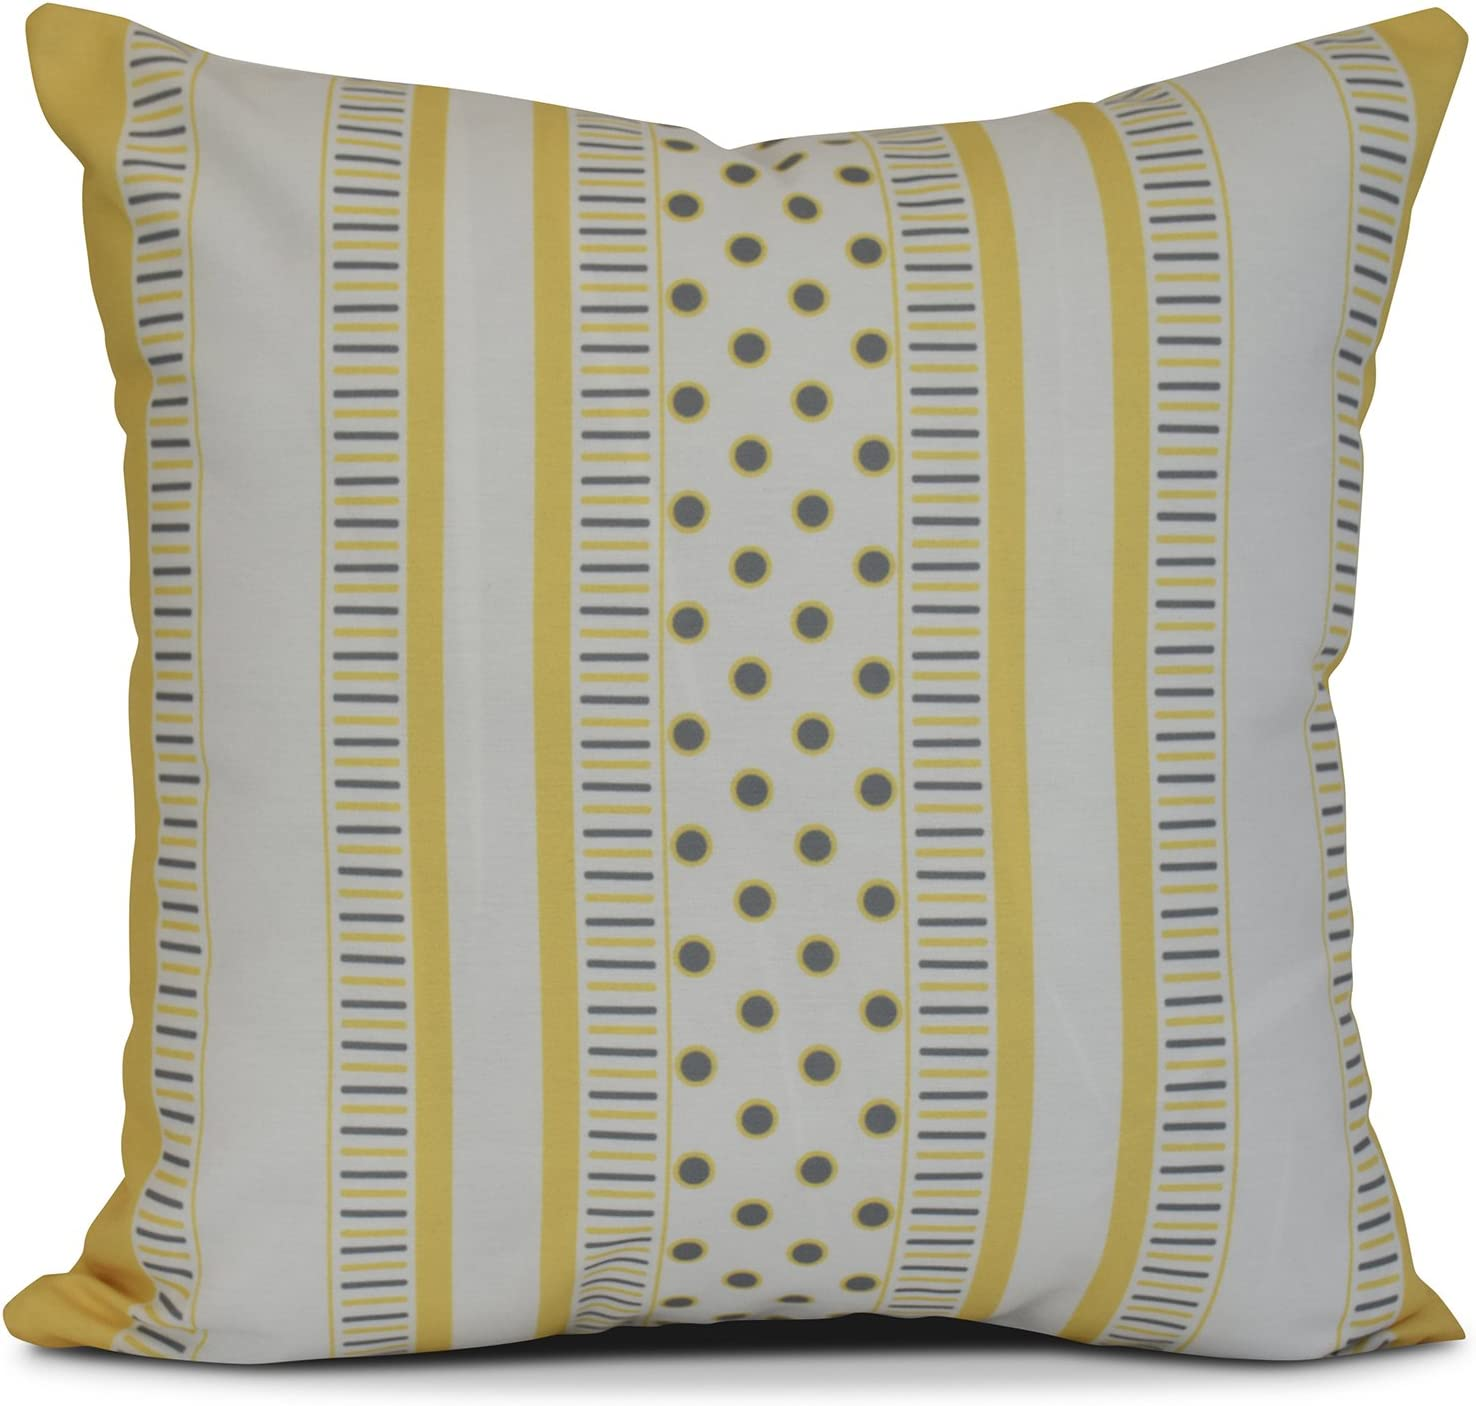 E by design Comb Dot Stripe Print Pillow 18 x 18 Navy Blue